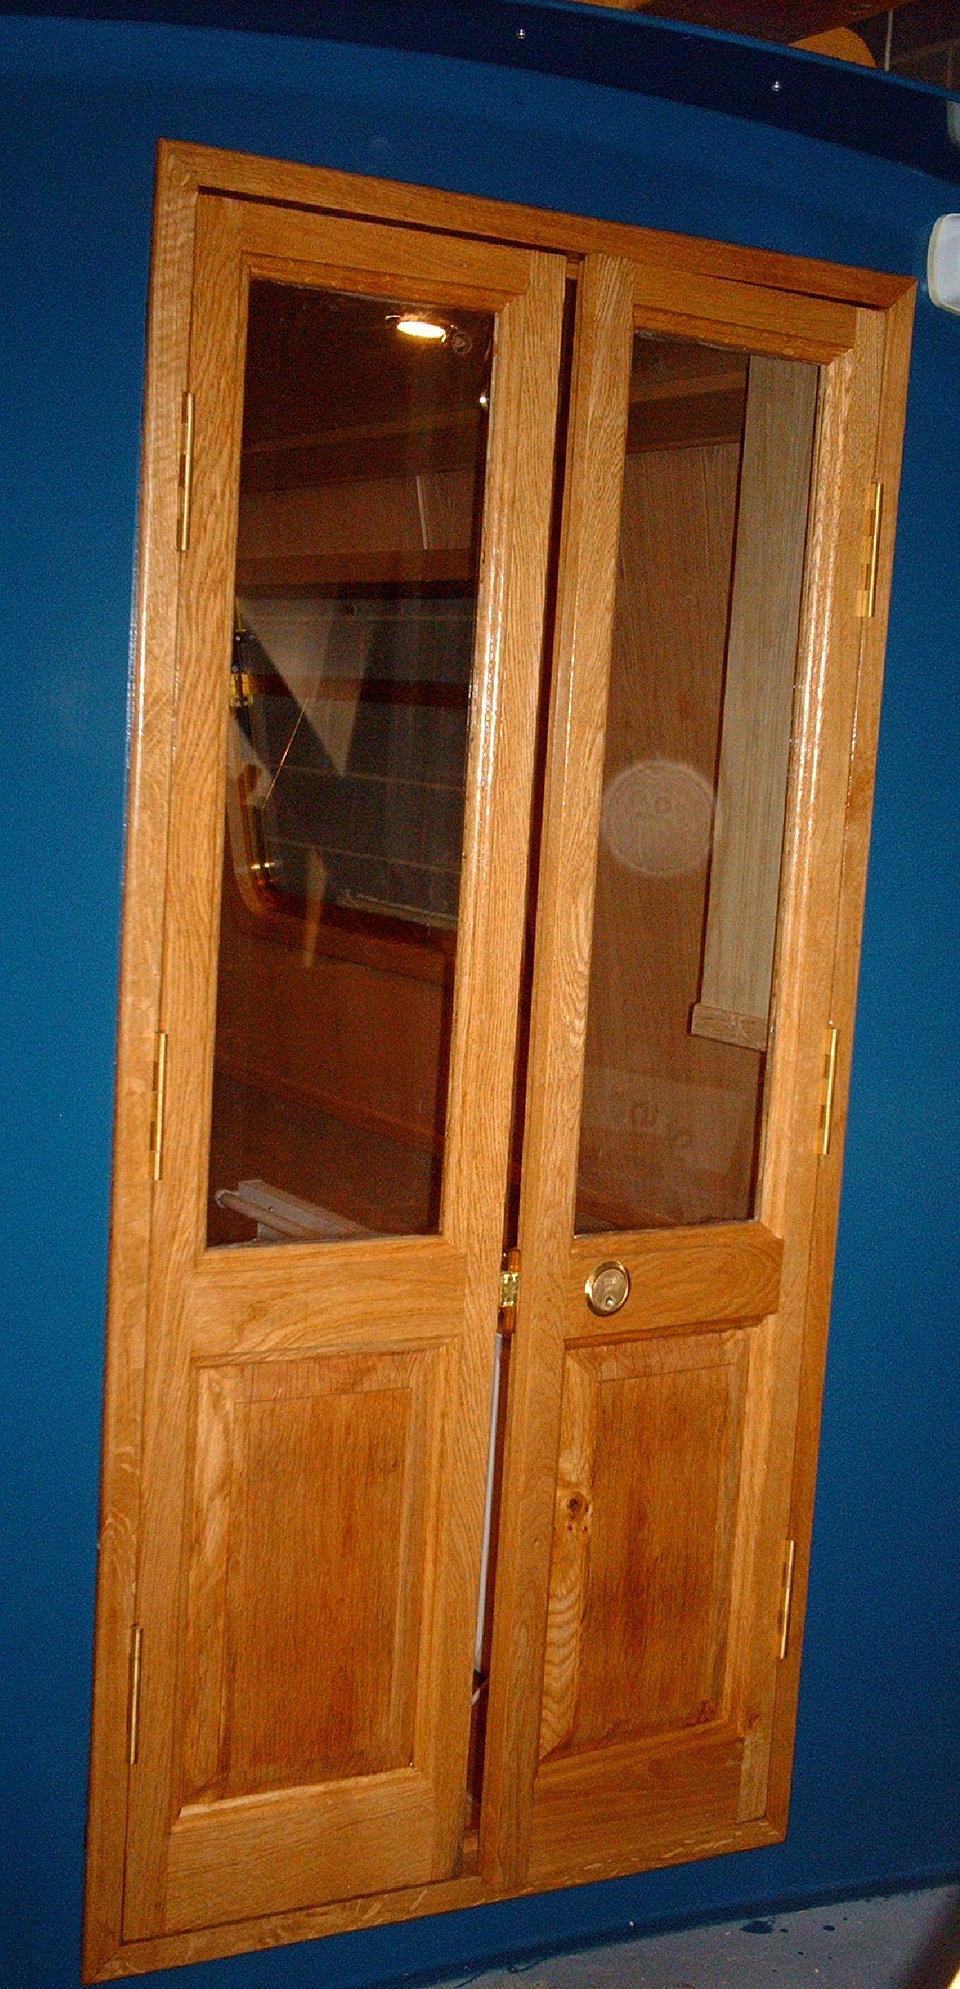 EXTERIOR DOOR - FRONT - OAK.JPG & Tallboy\u0027s Woodworking| Narrowboat Doors and Cratch| Derbyshire